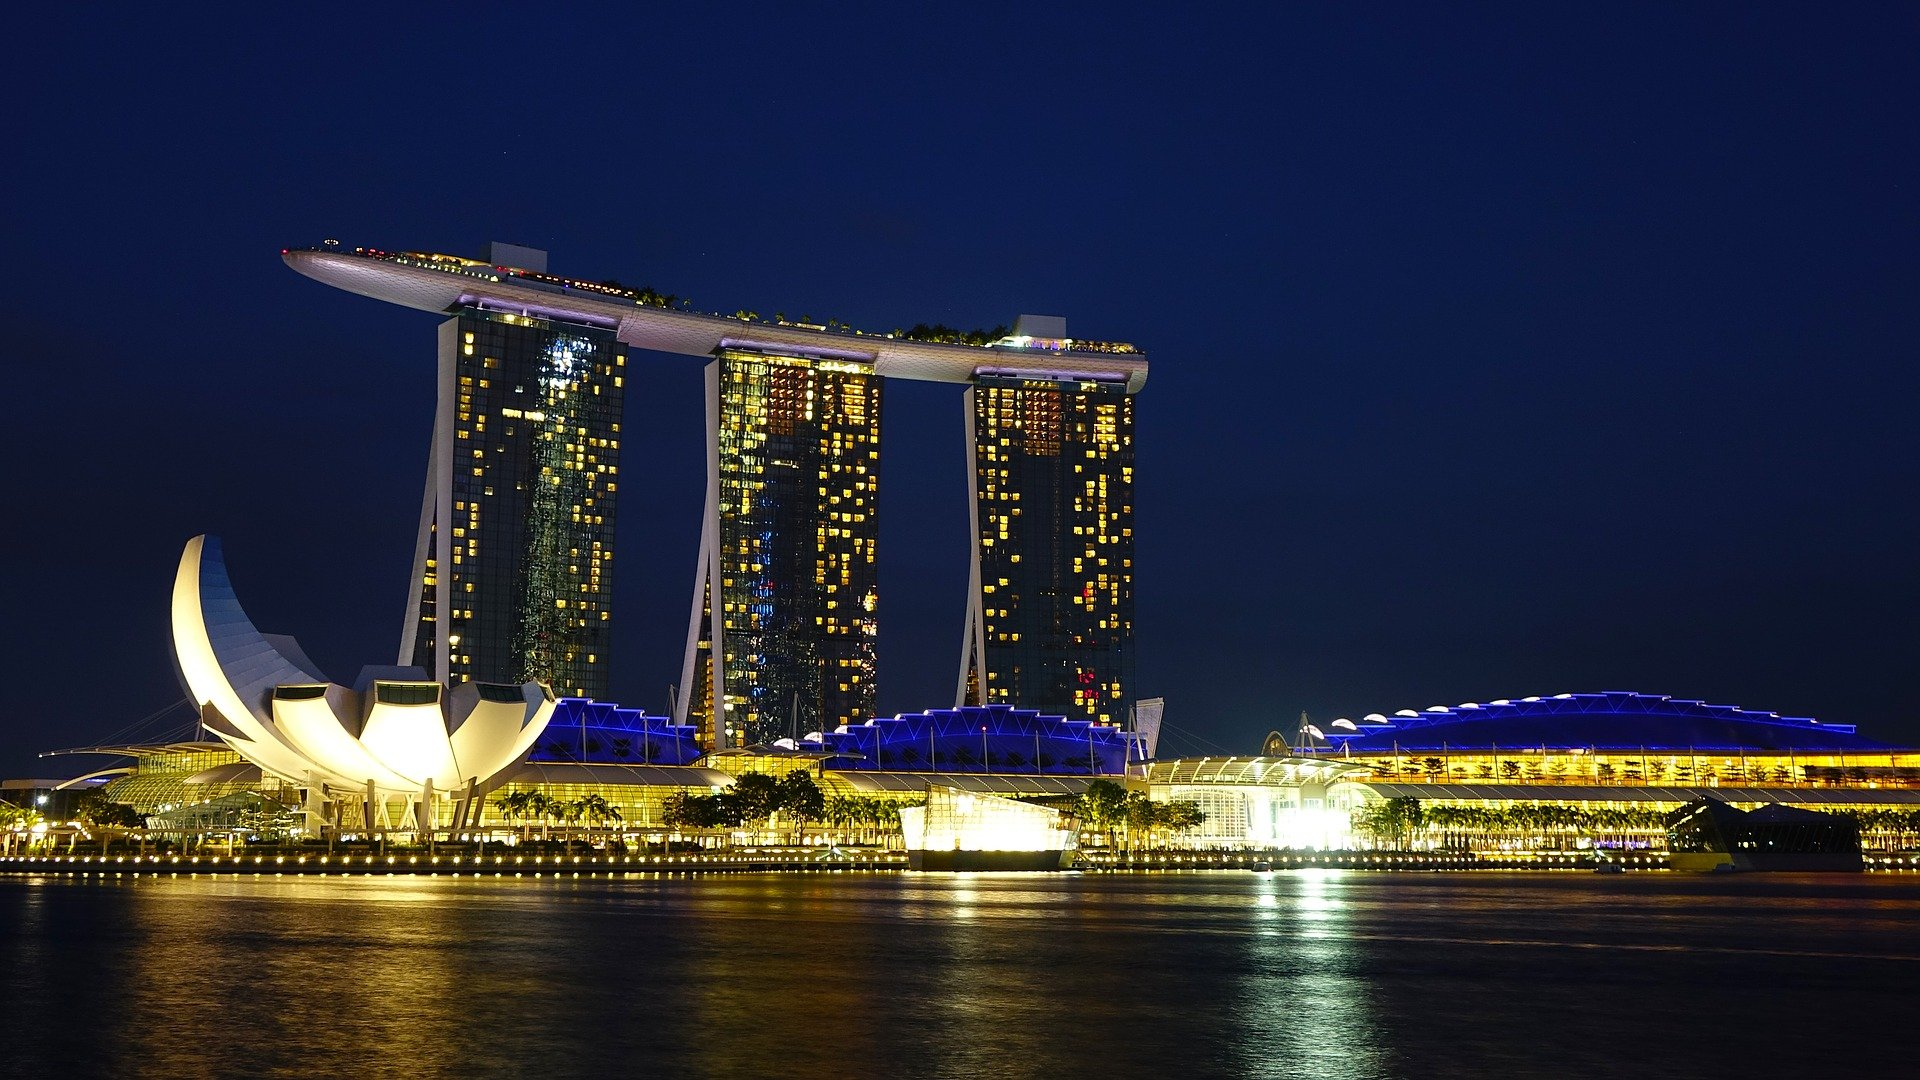 kmt-singapore-gallery-1